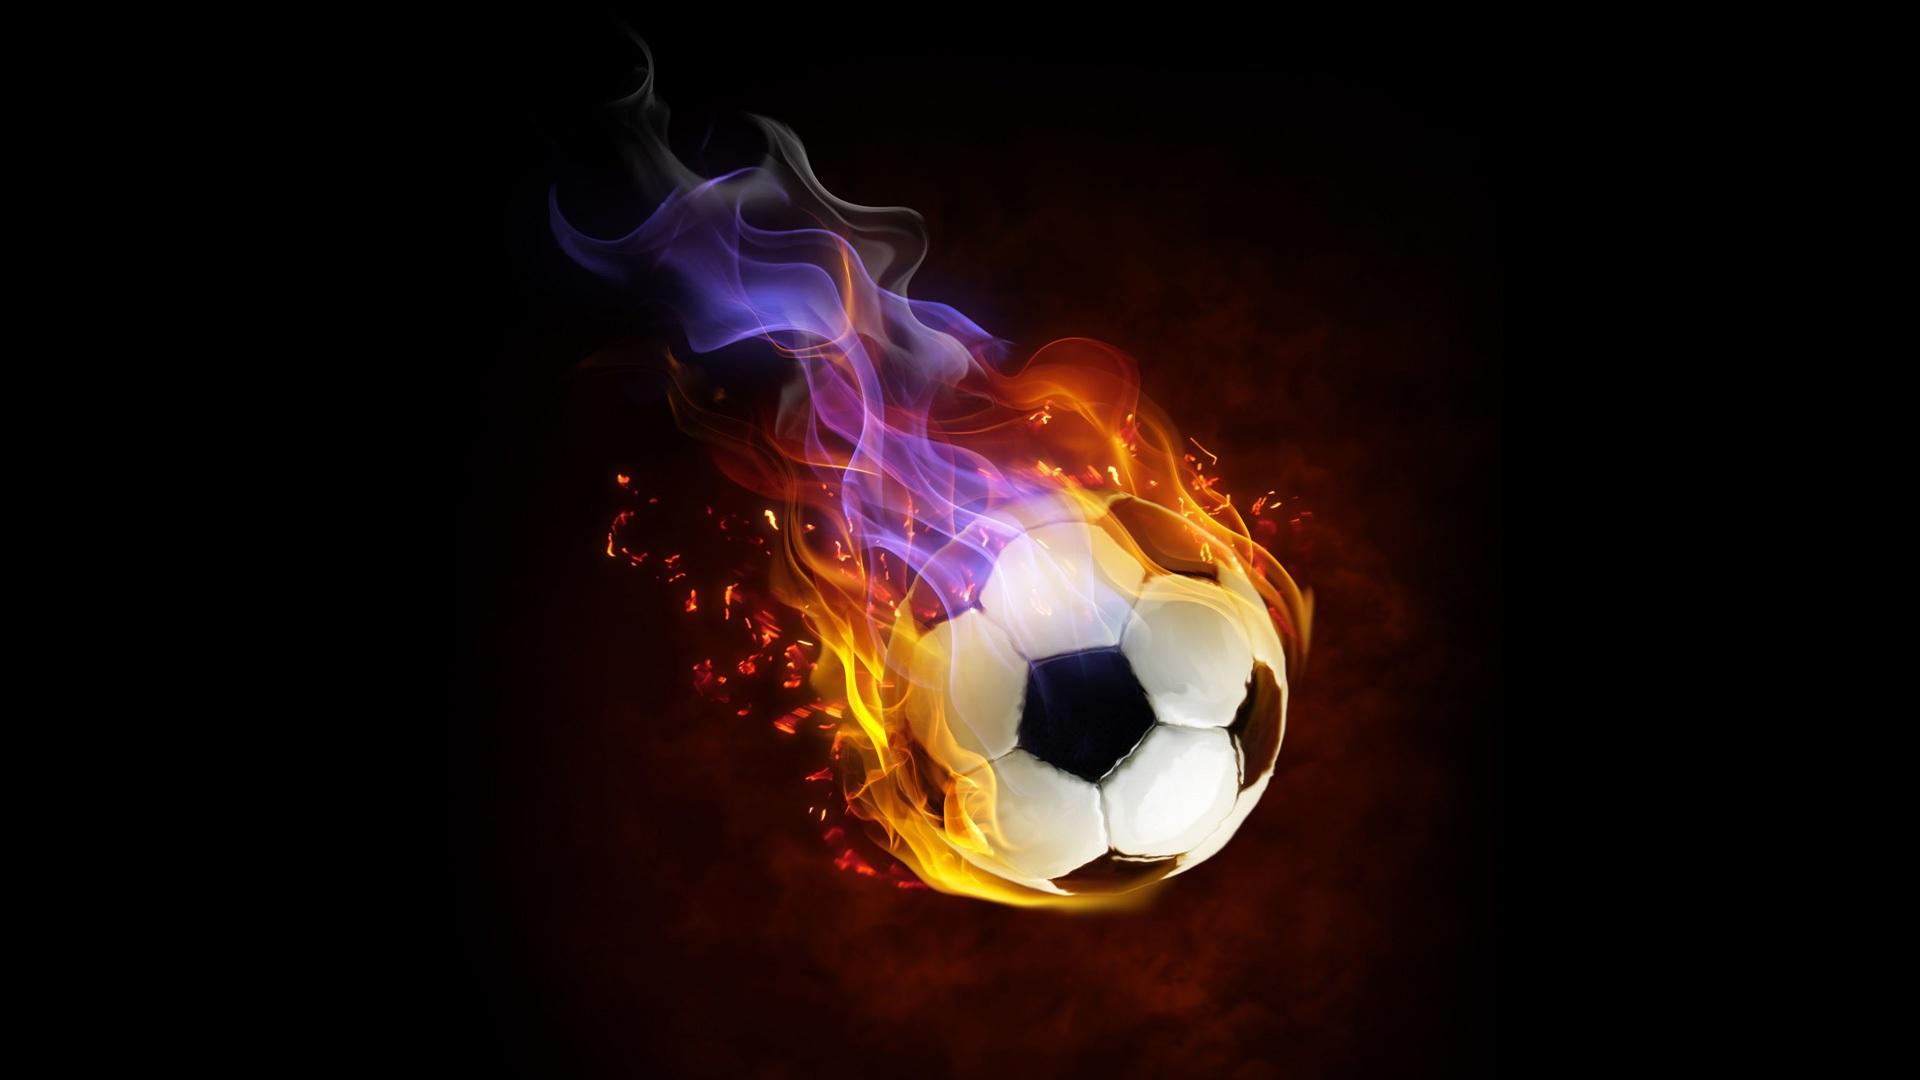 SoccerFootball wallpaper   ForWallpapercom 1920x1080